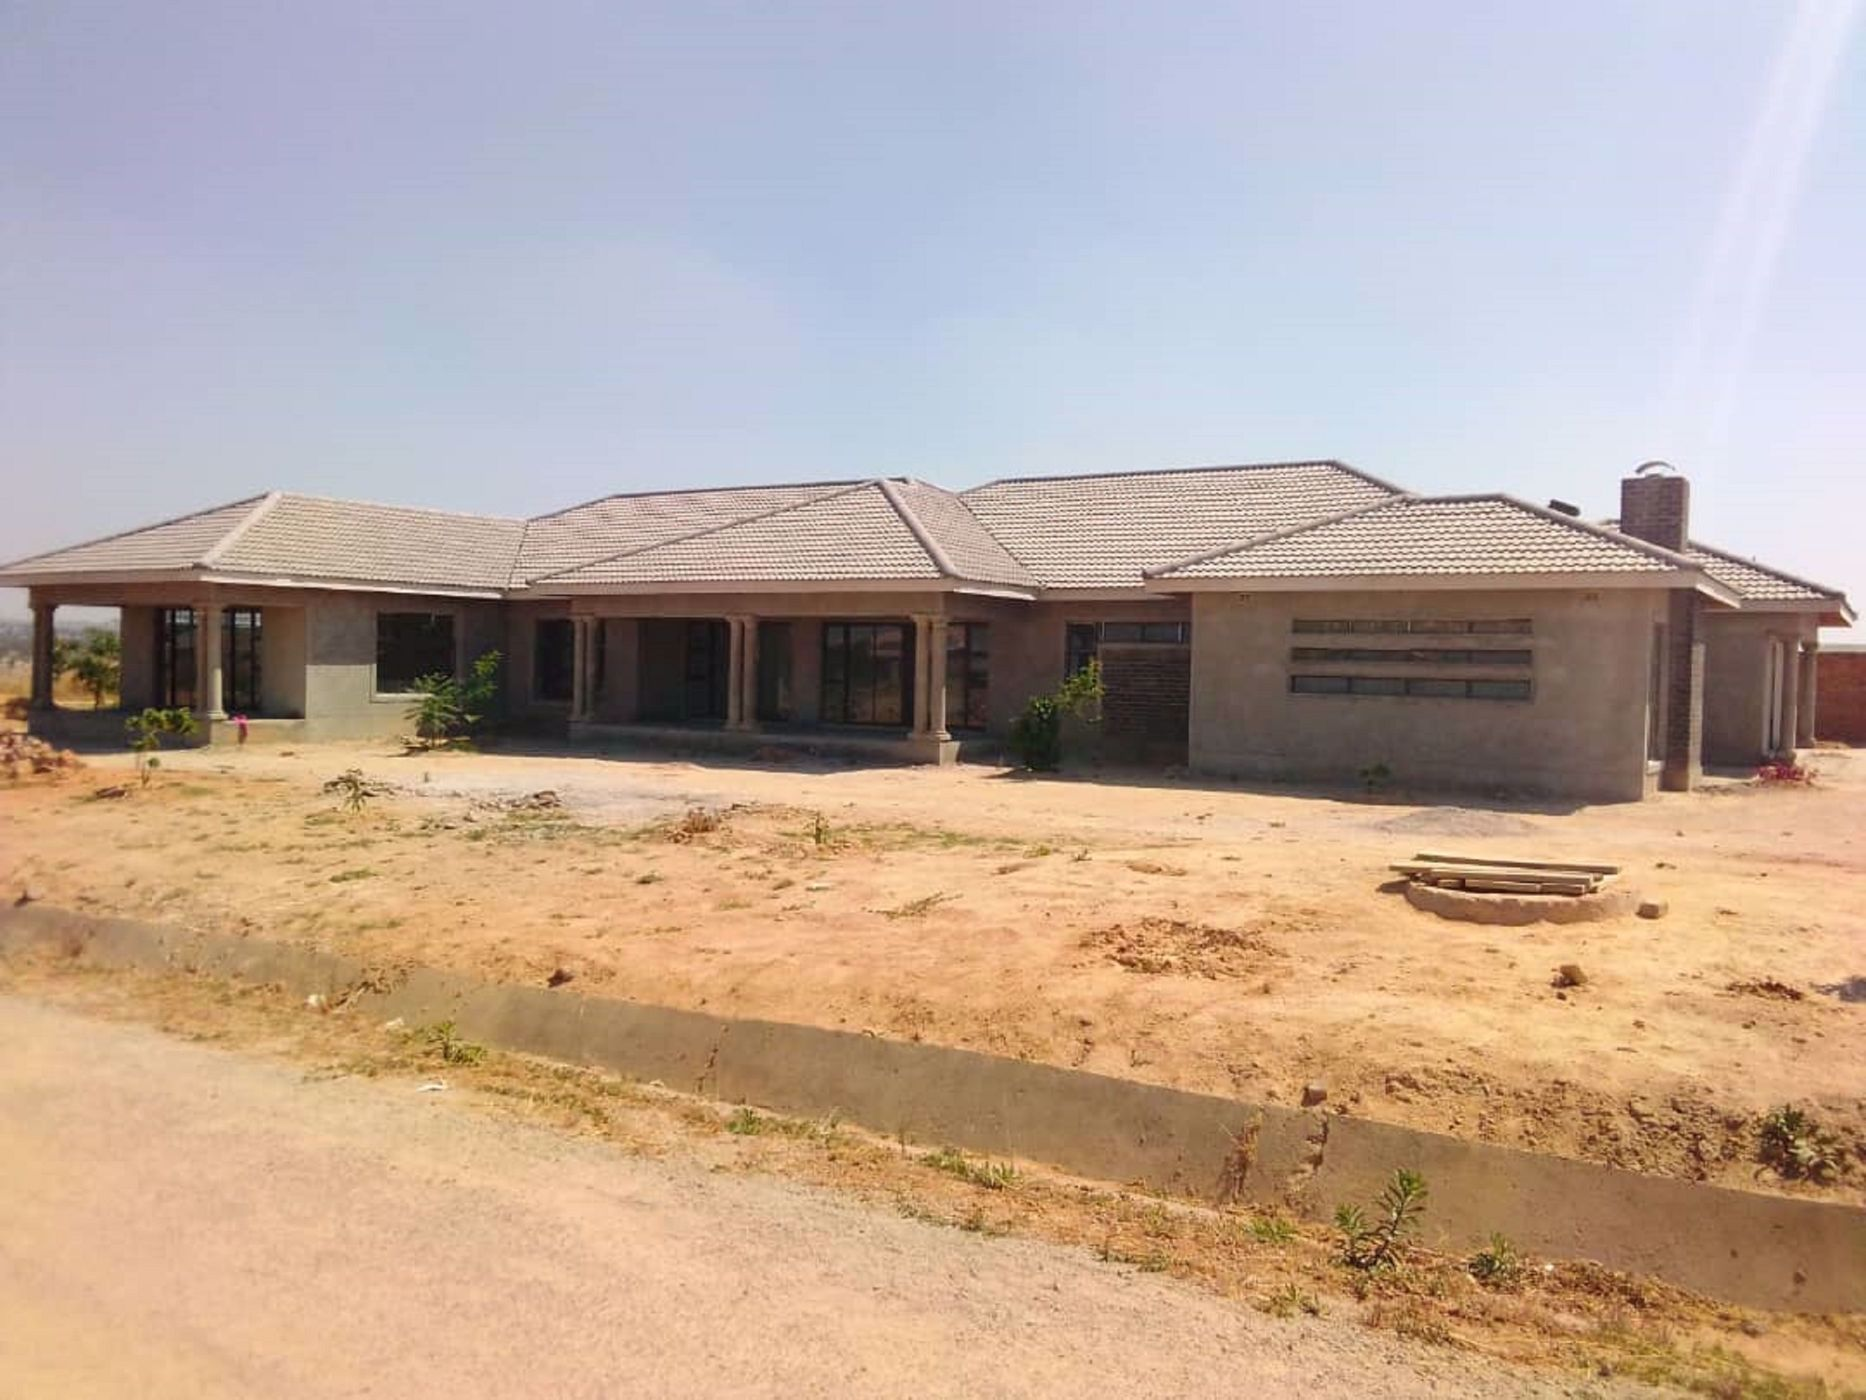 4 bedroom house for sale in Rockview (Zimbabwe)